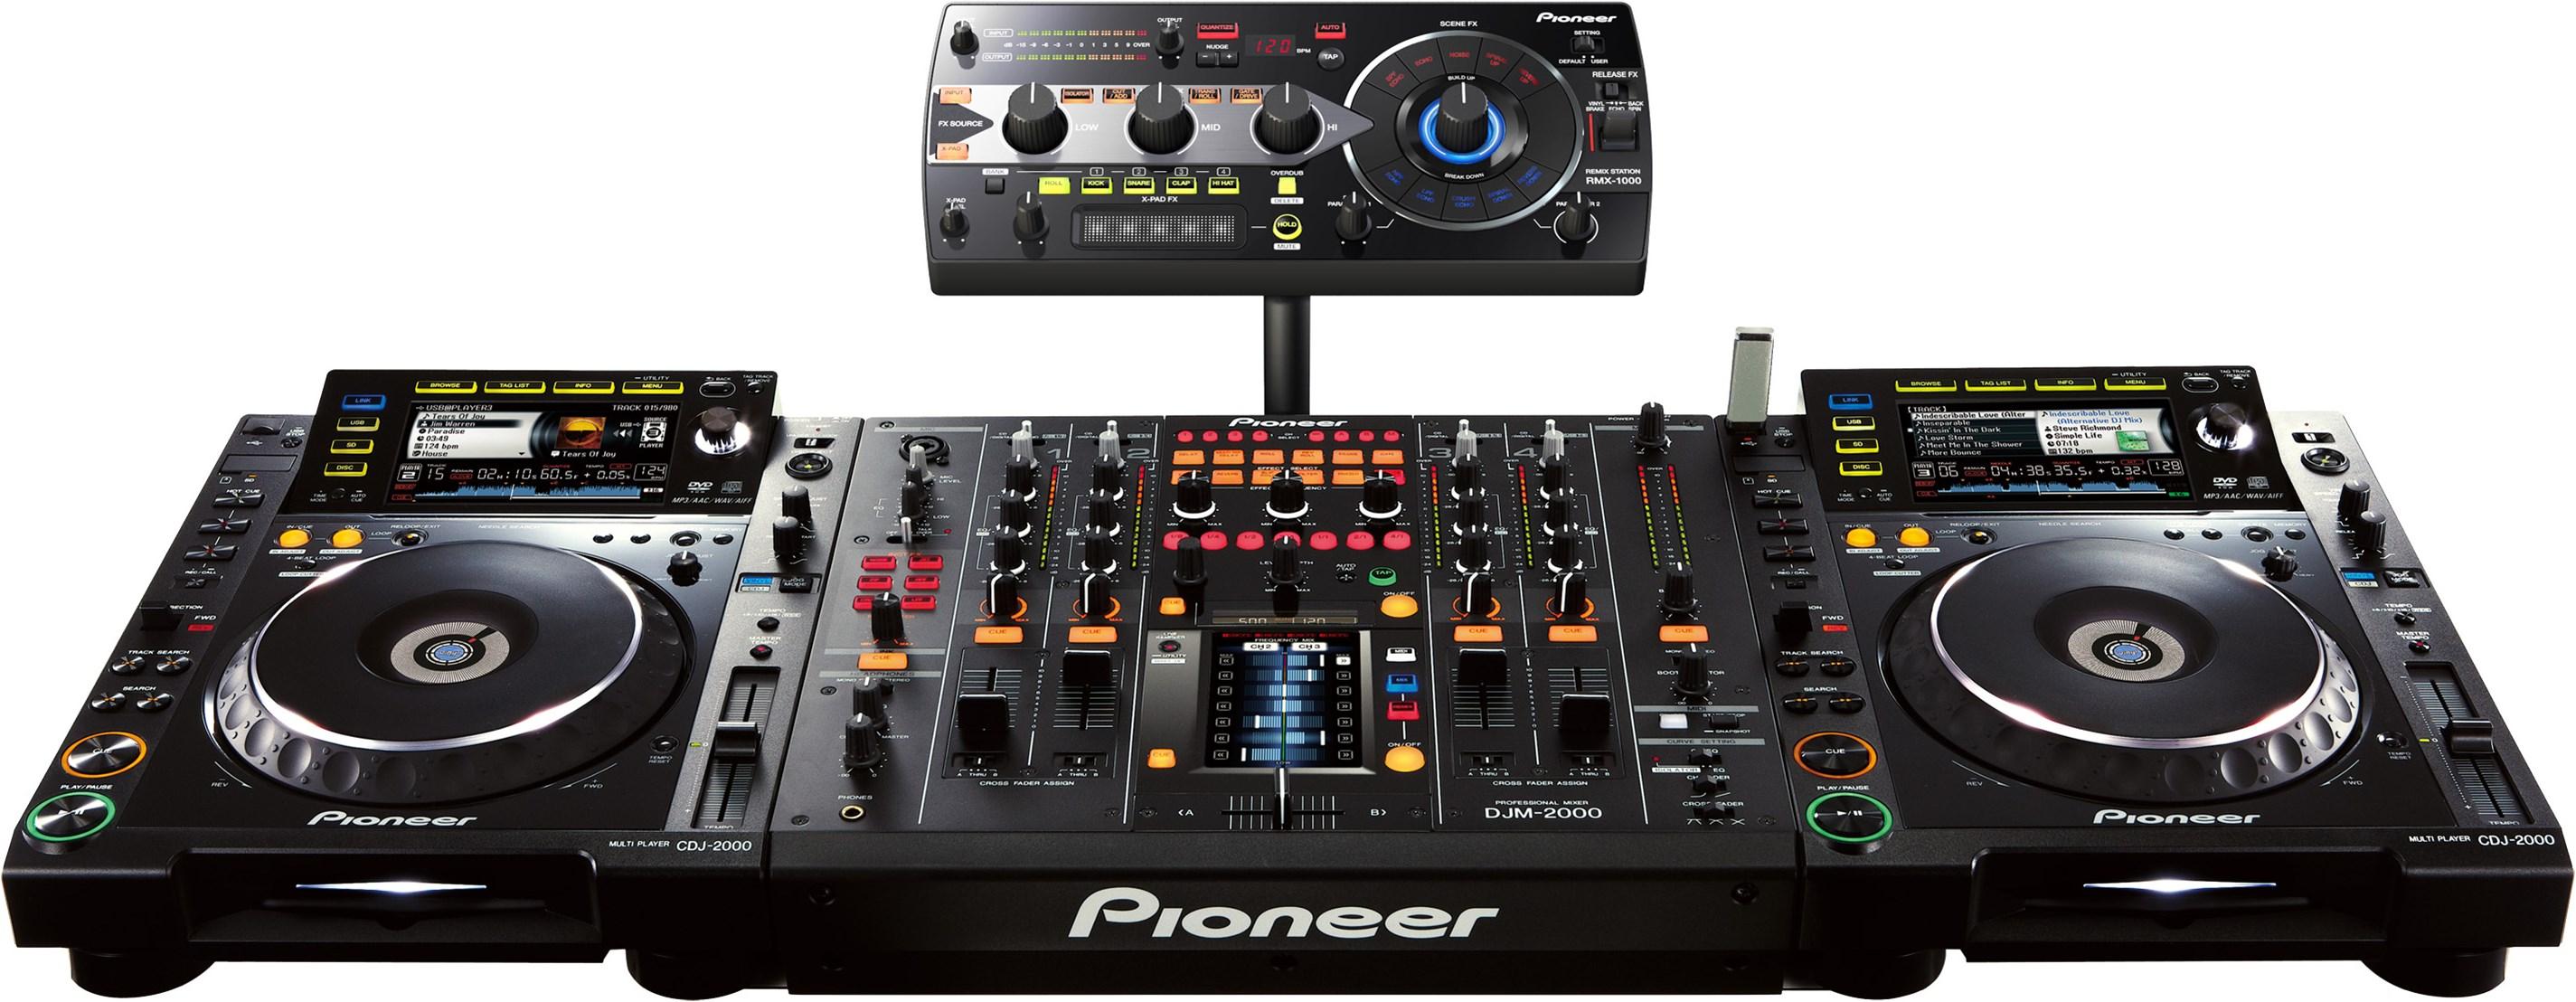 Pioneer DJ DJ Mixer Black RMX-1000 DJ Equipment Musical ...